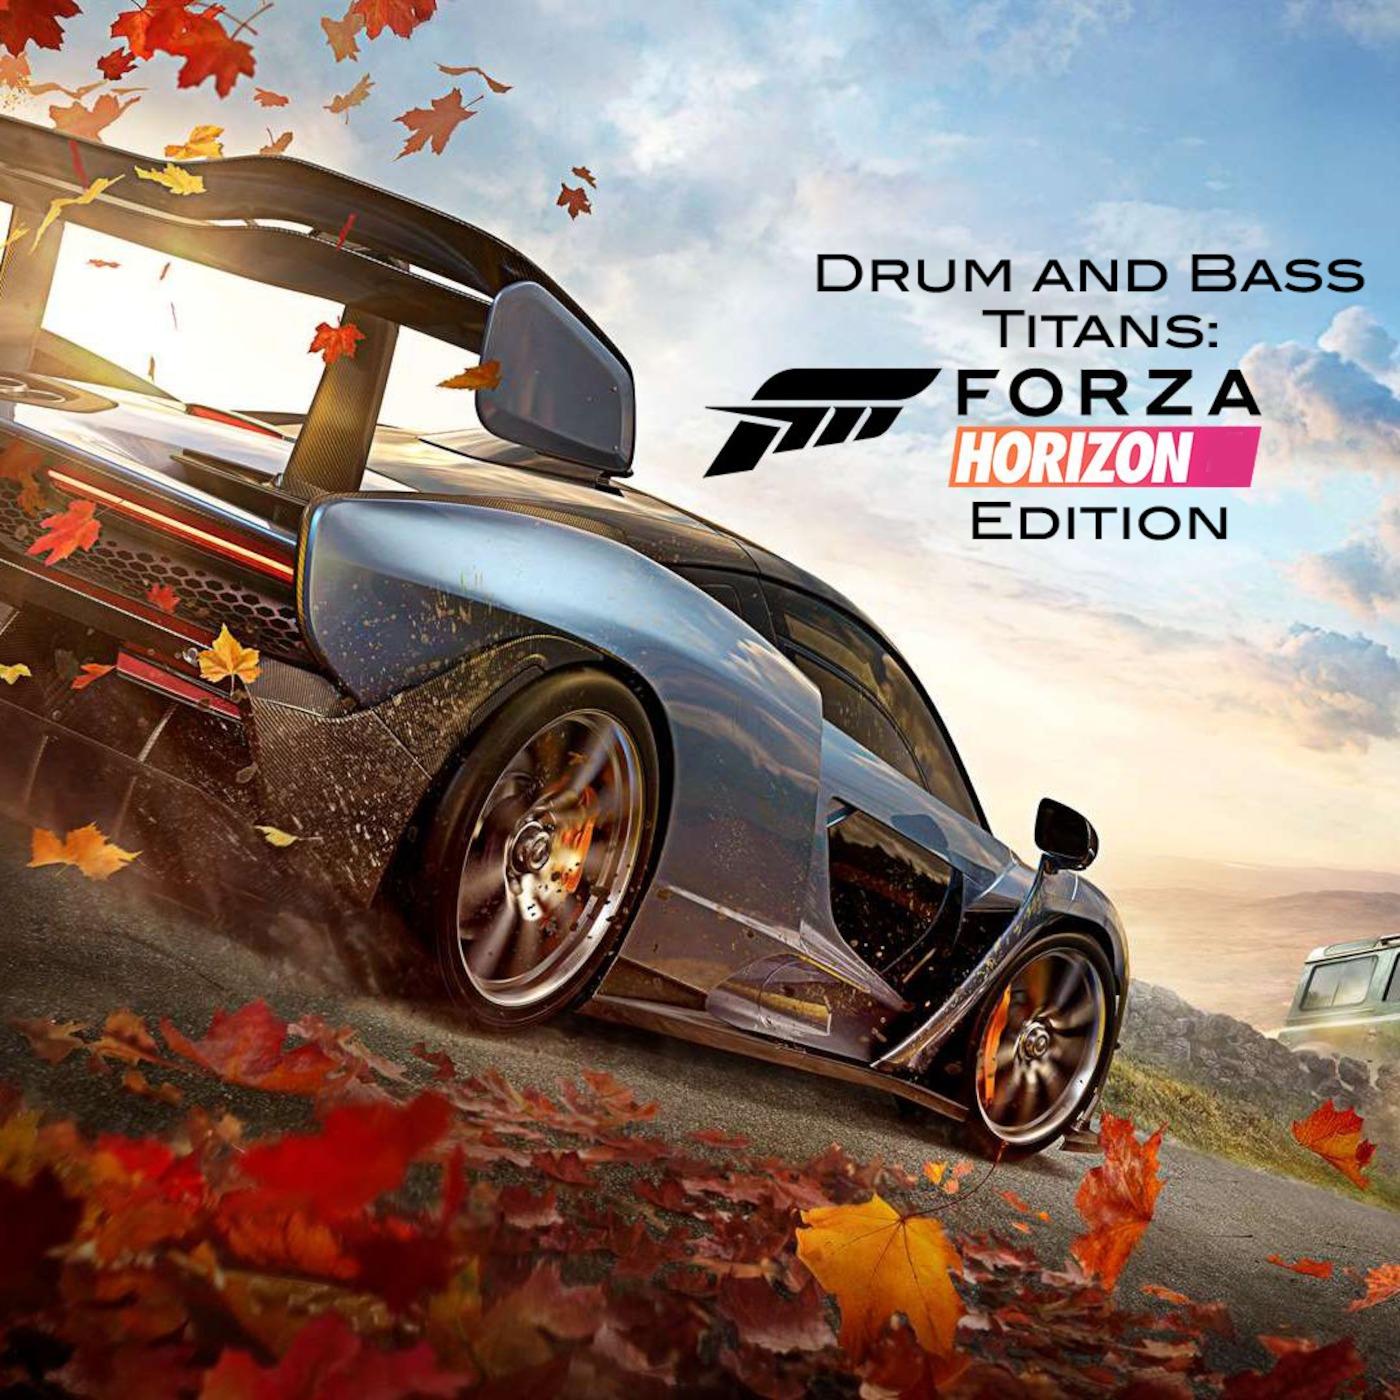 Drum And Bass Titans: Forza Horizon Edition Uplifting